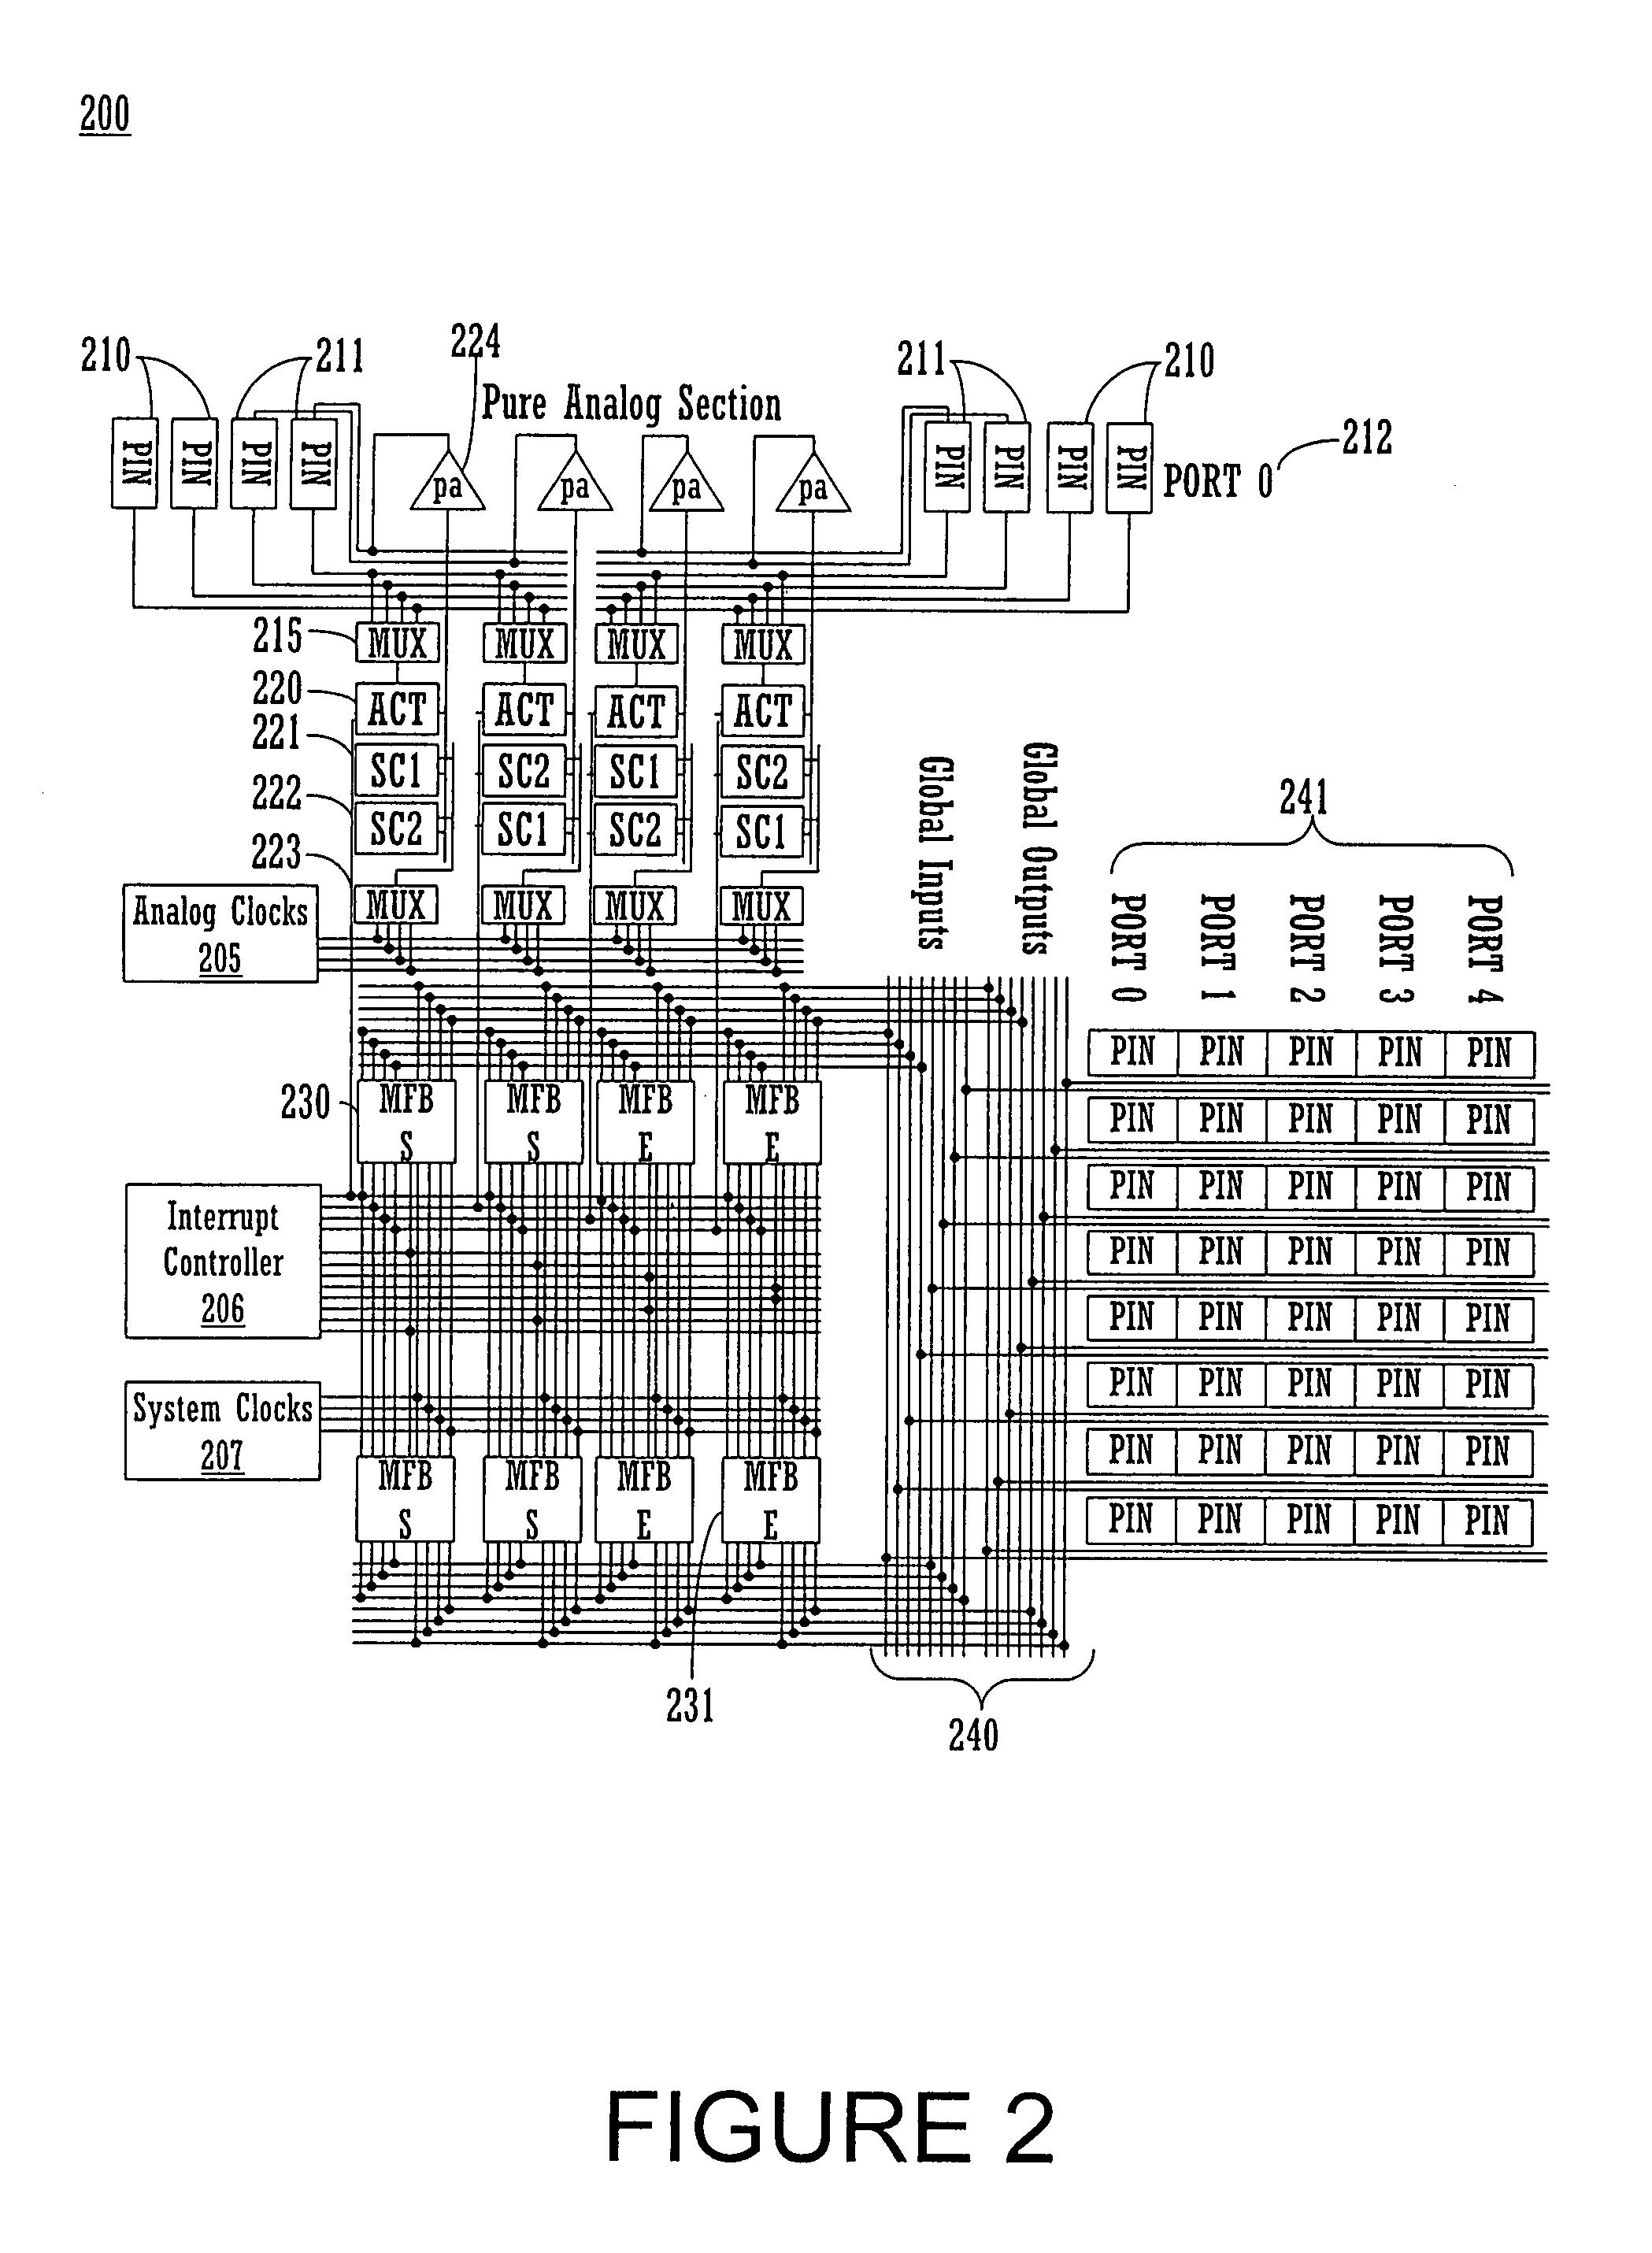 patent us 7825688 b1